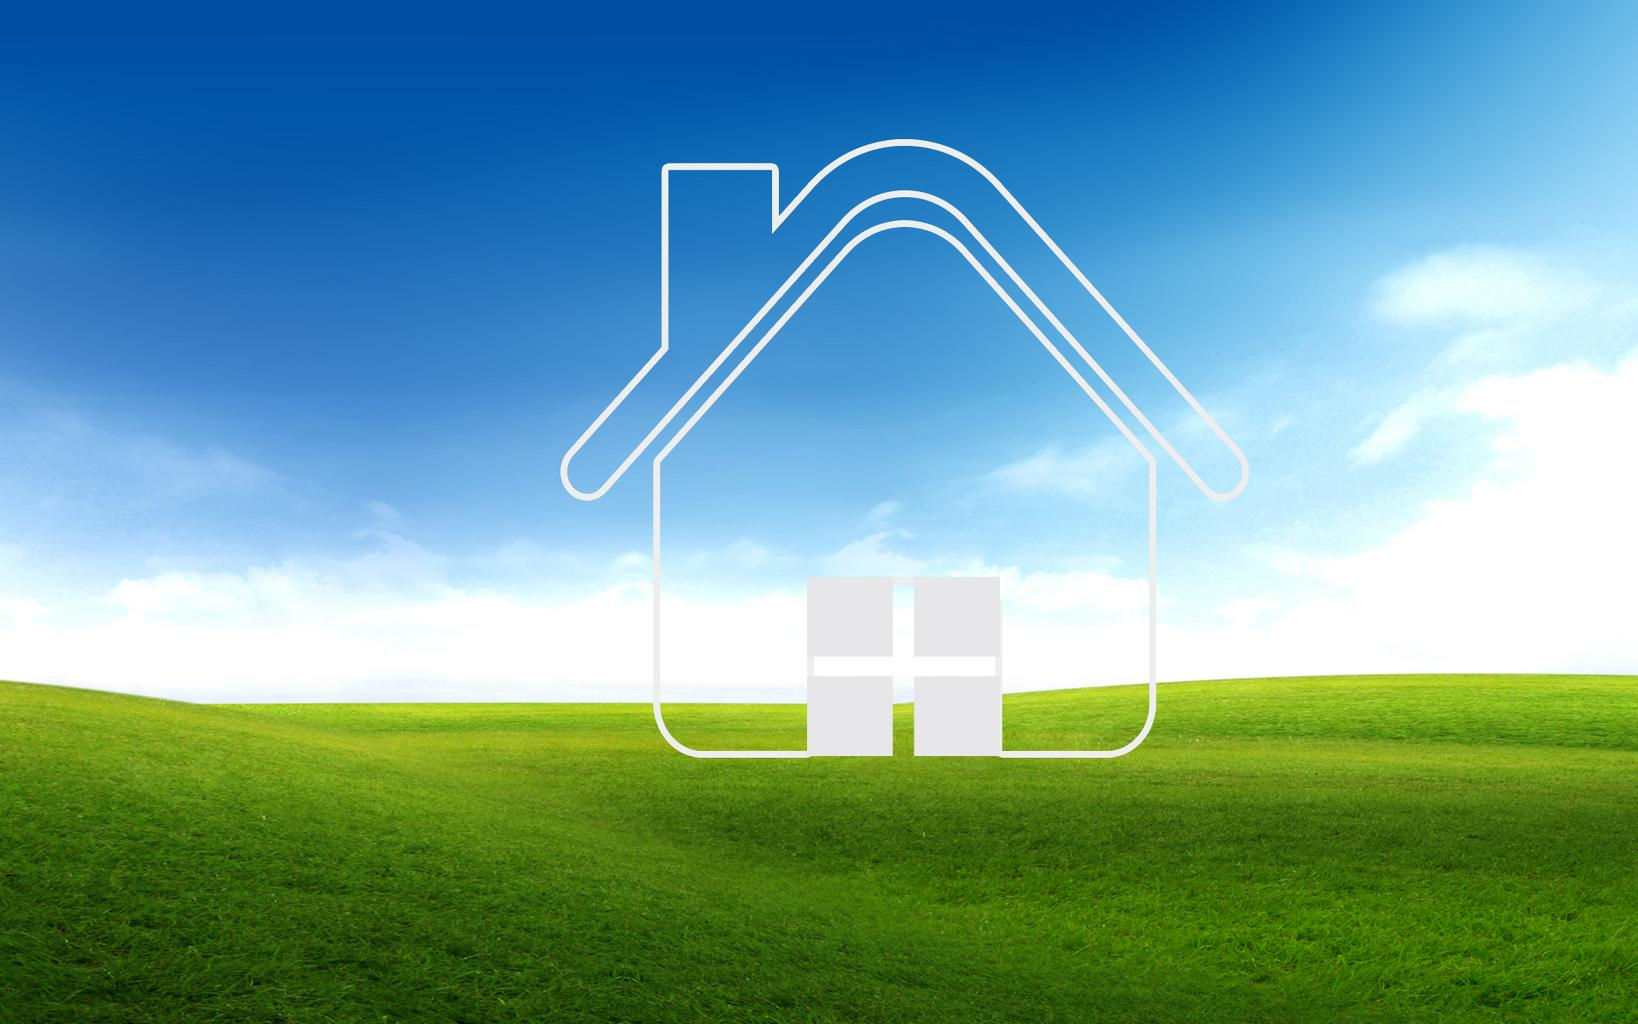 house_concept_with_landscape